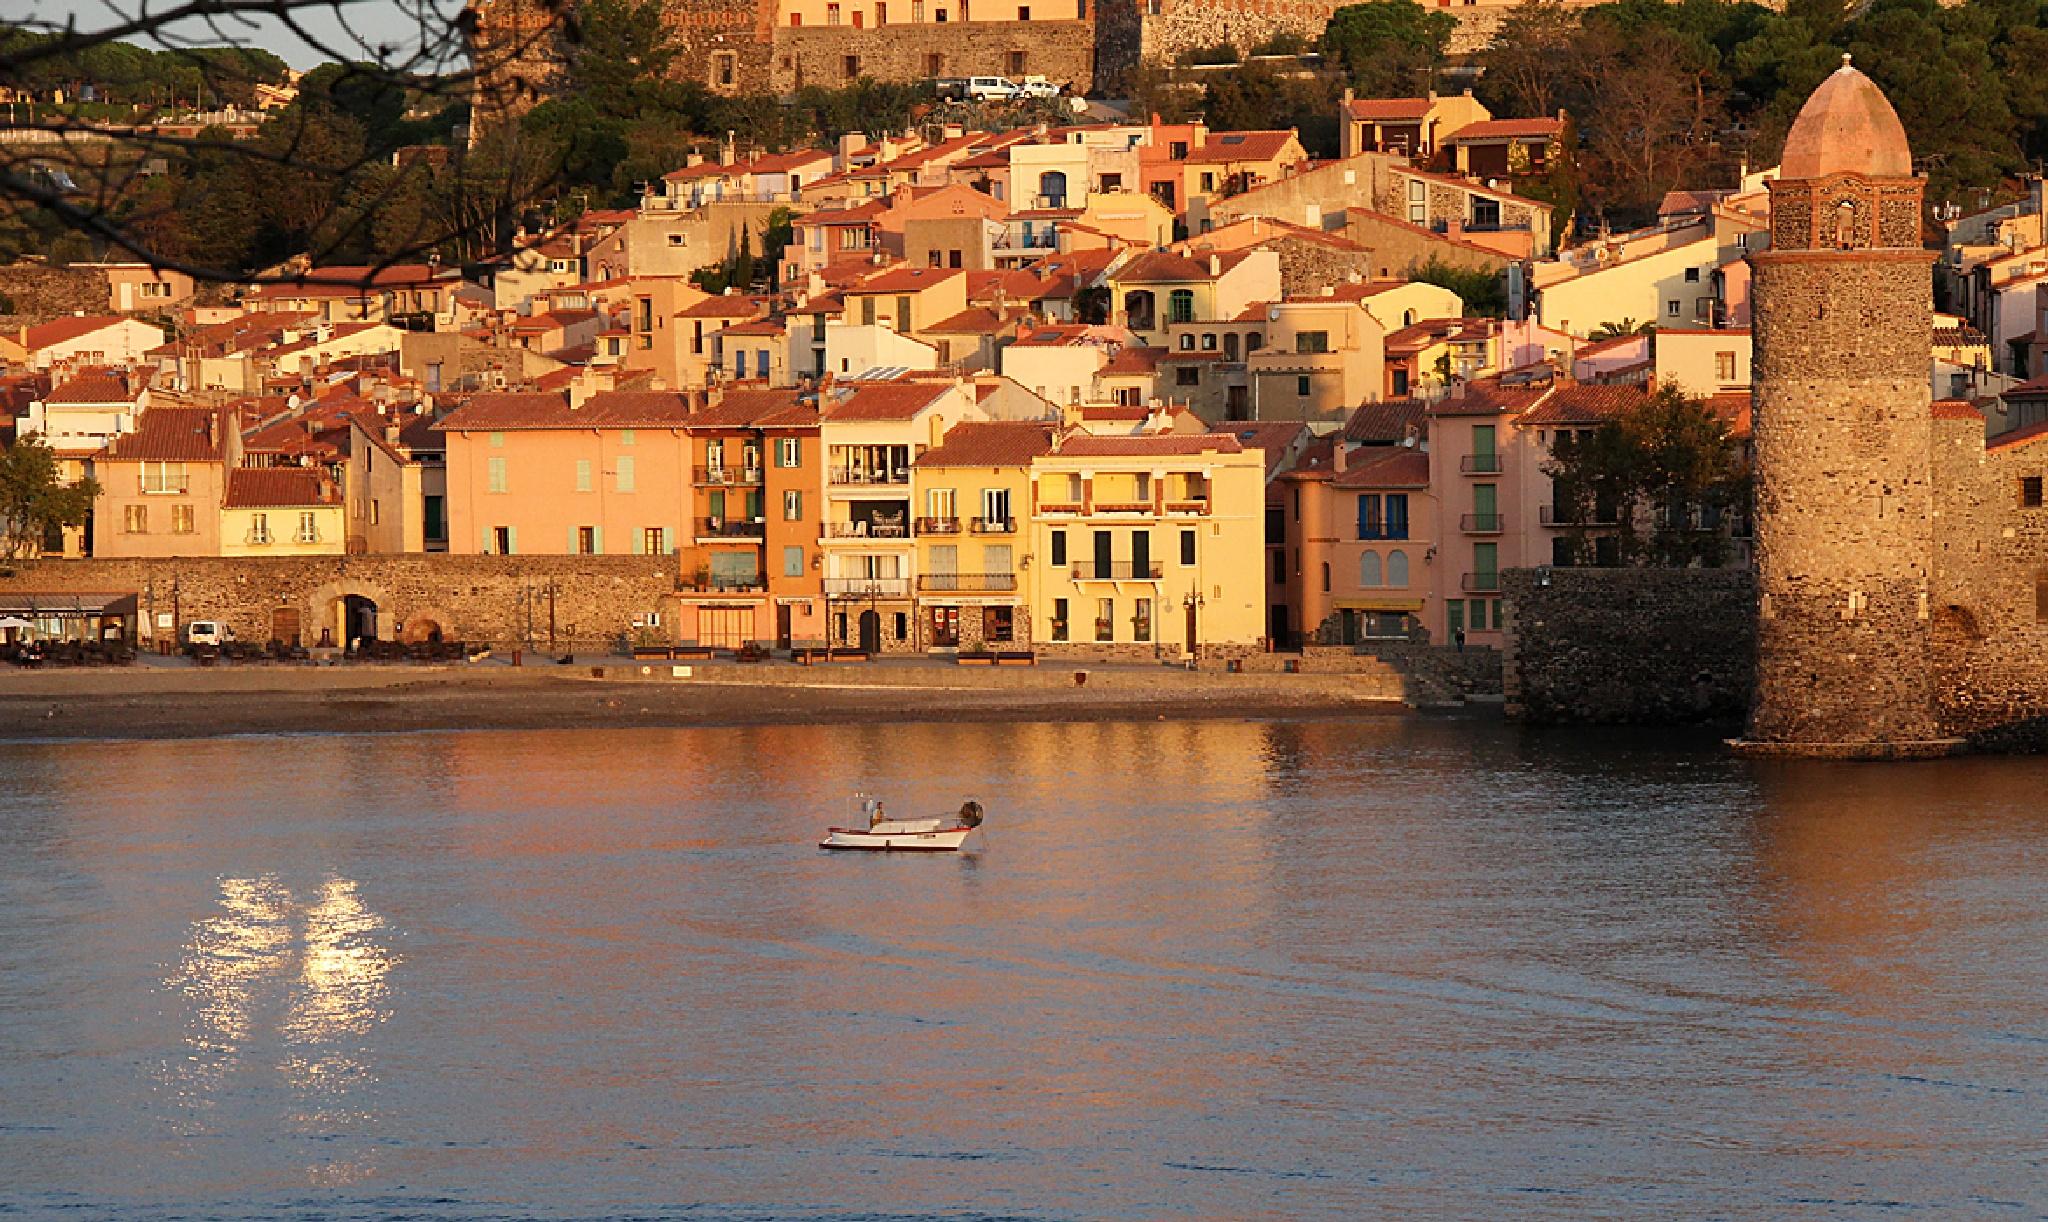 Collioure - Morning Sun by Carl Main